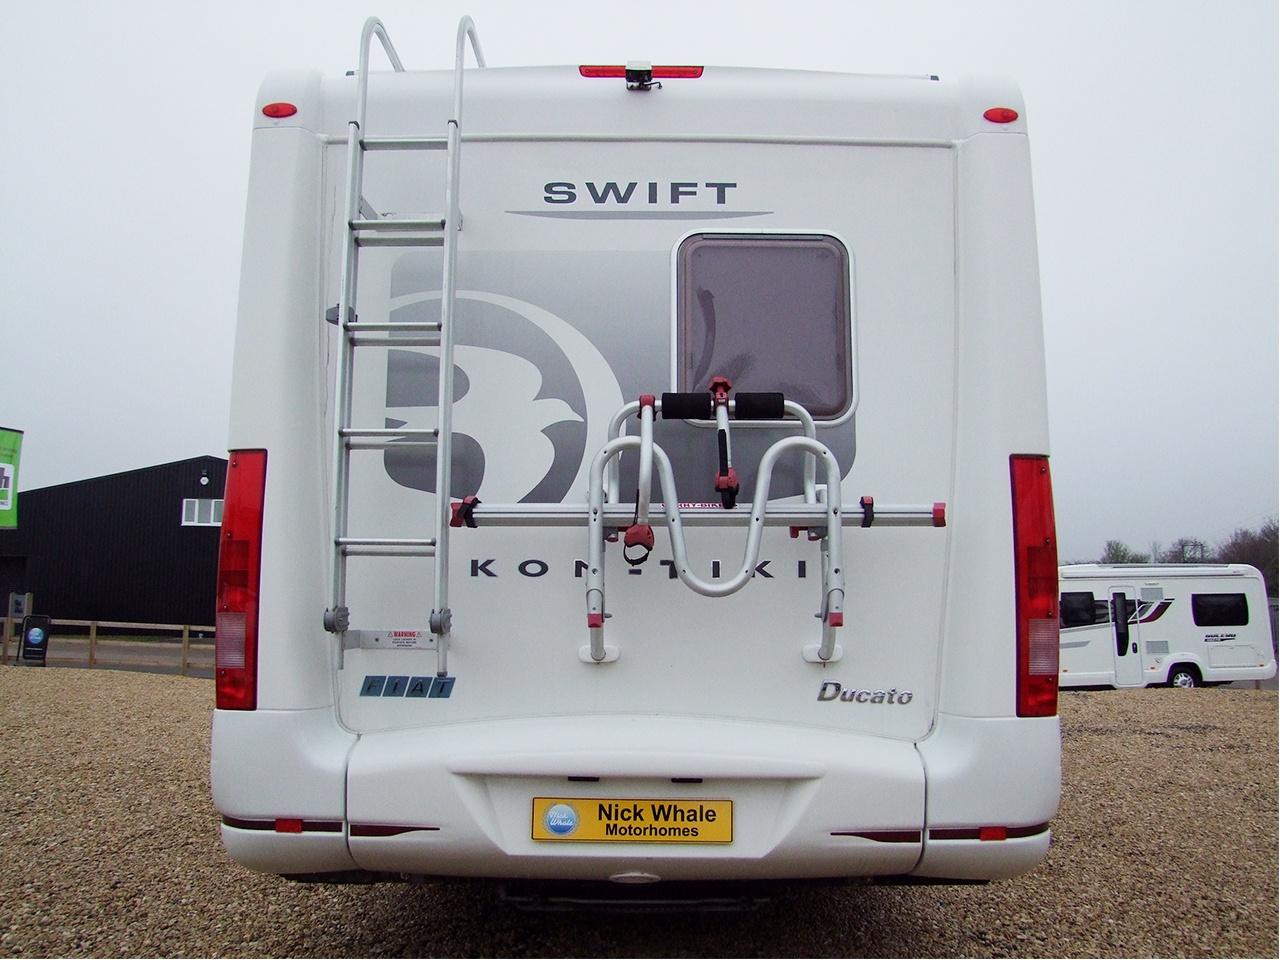 Swift Kontiki 650 Nick Whale Motorhomes